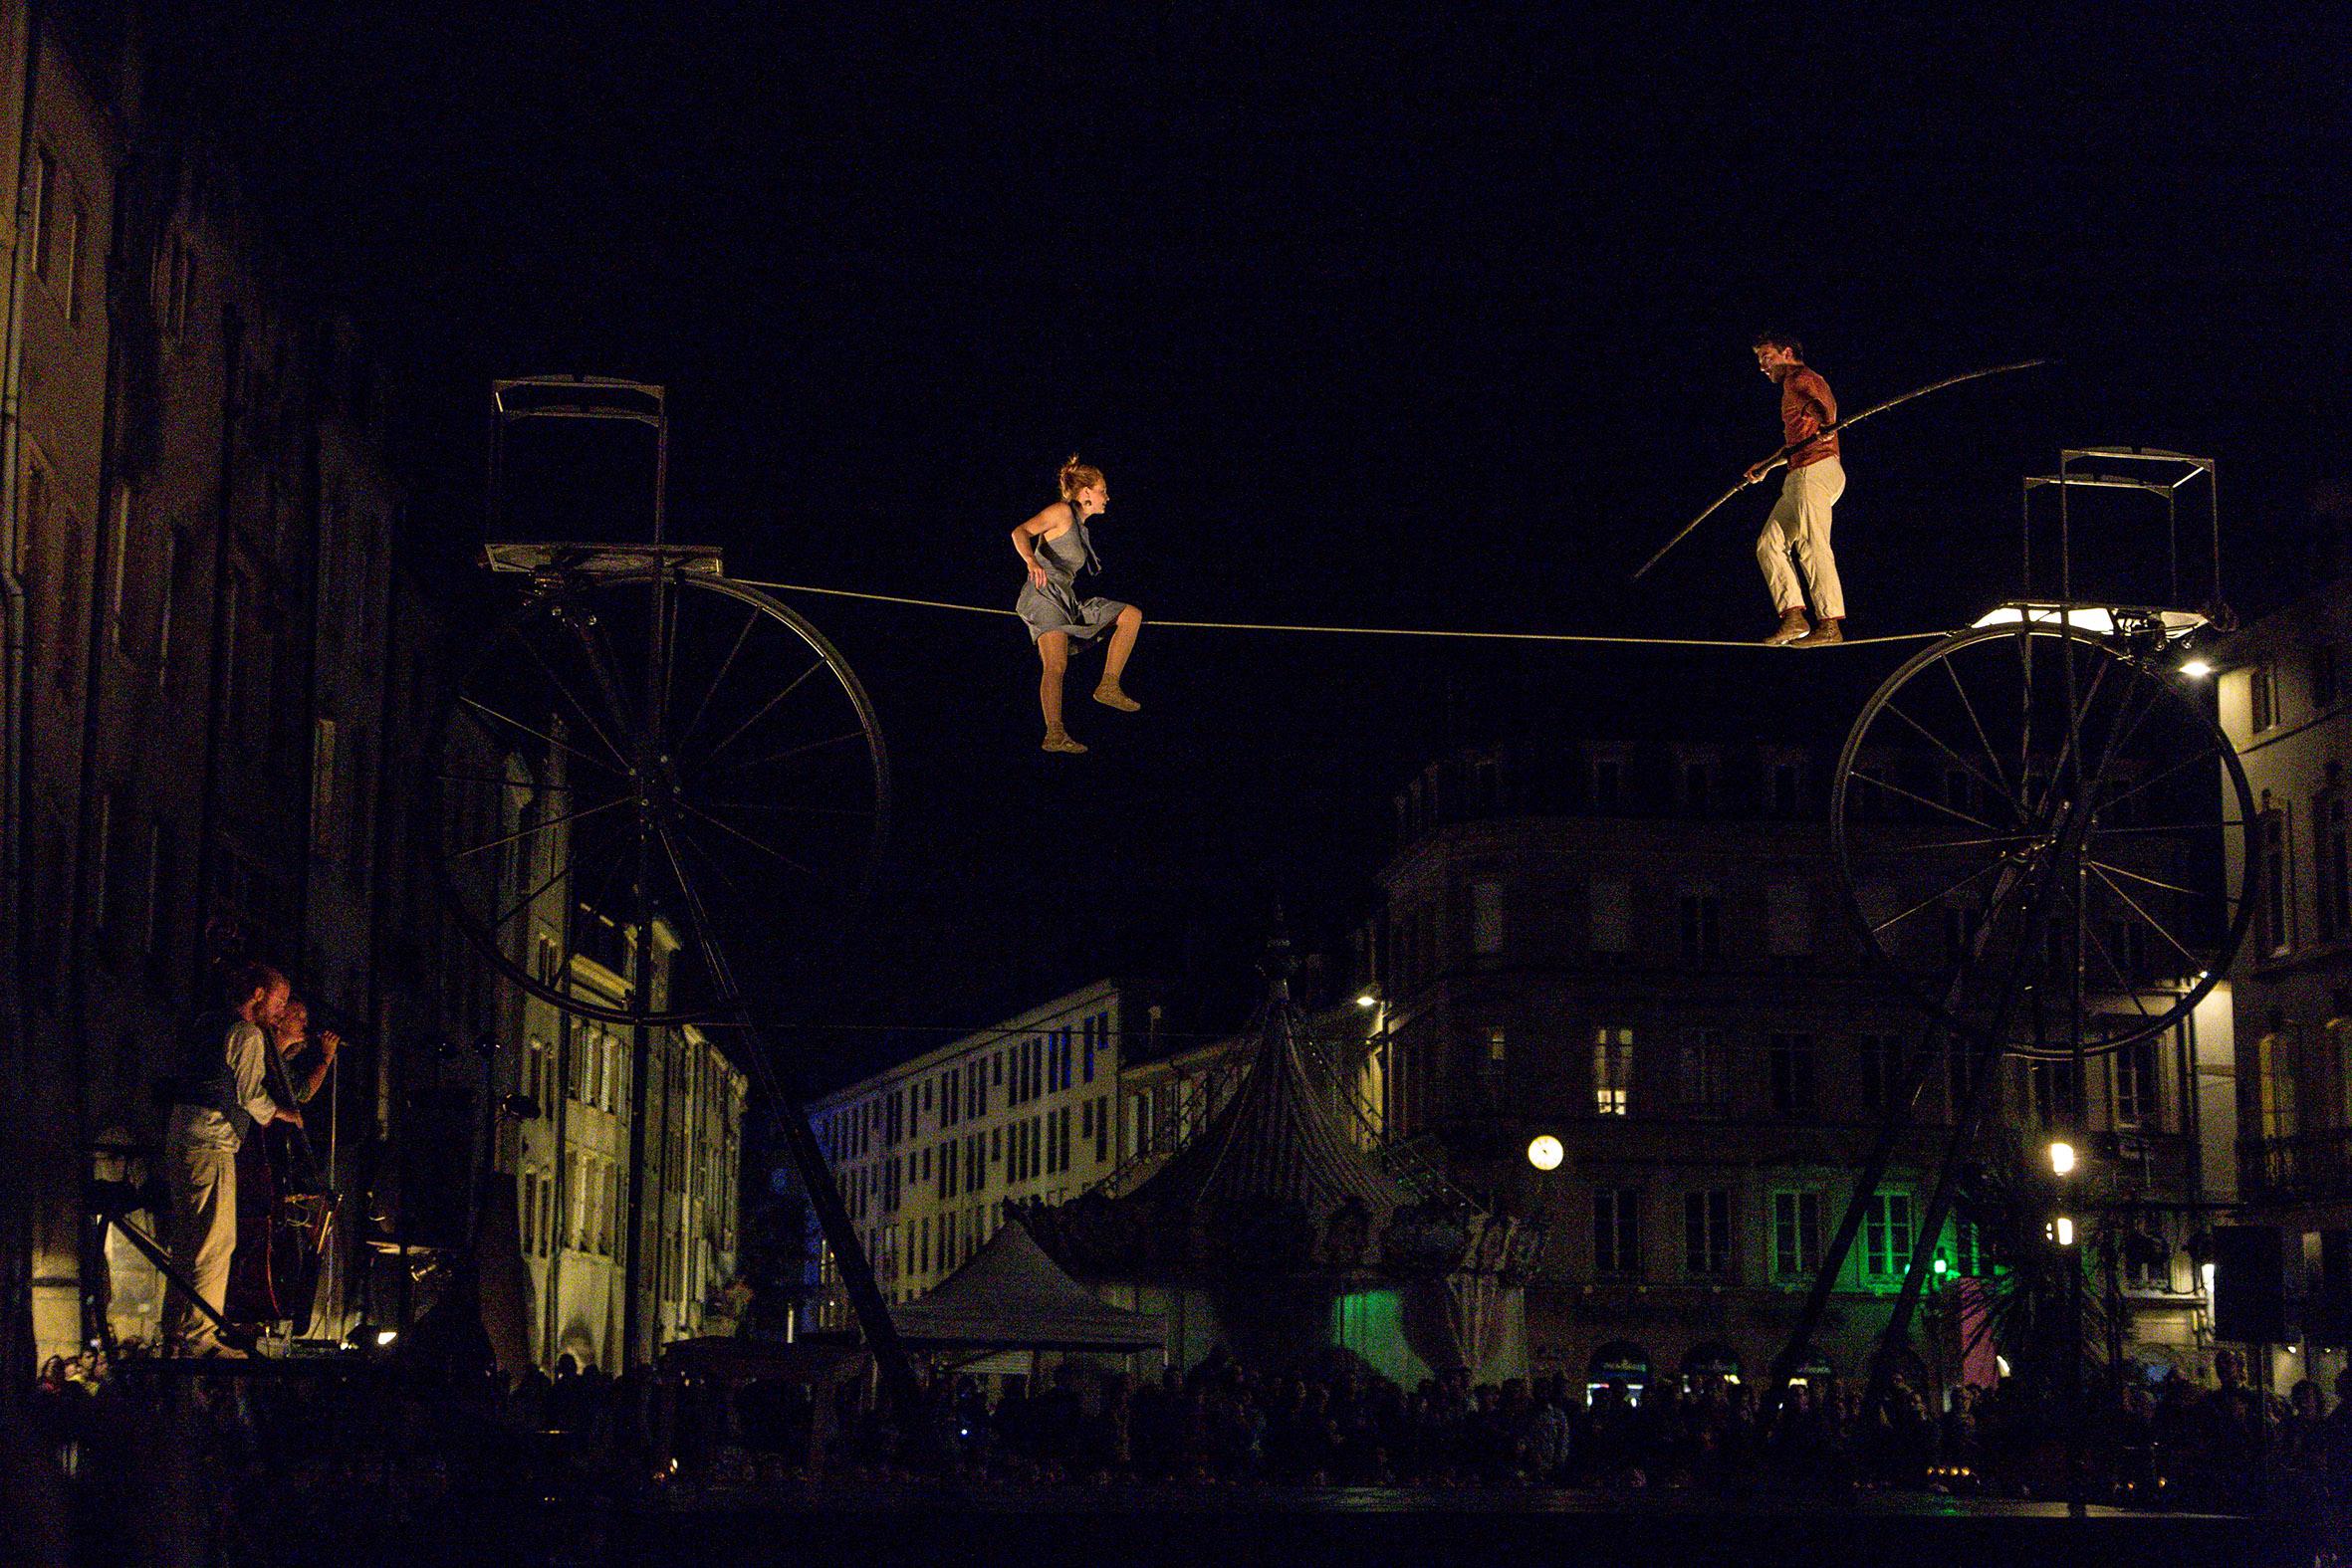 spectacles-sodade-cirque-rouage-mirabelle-metz-2015-marie-colette-becker-05